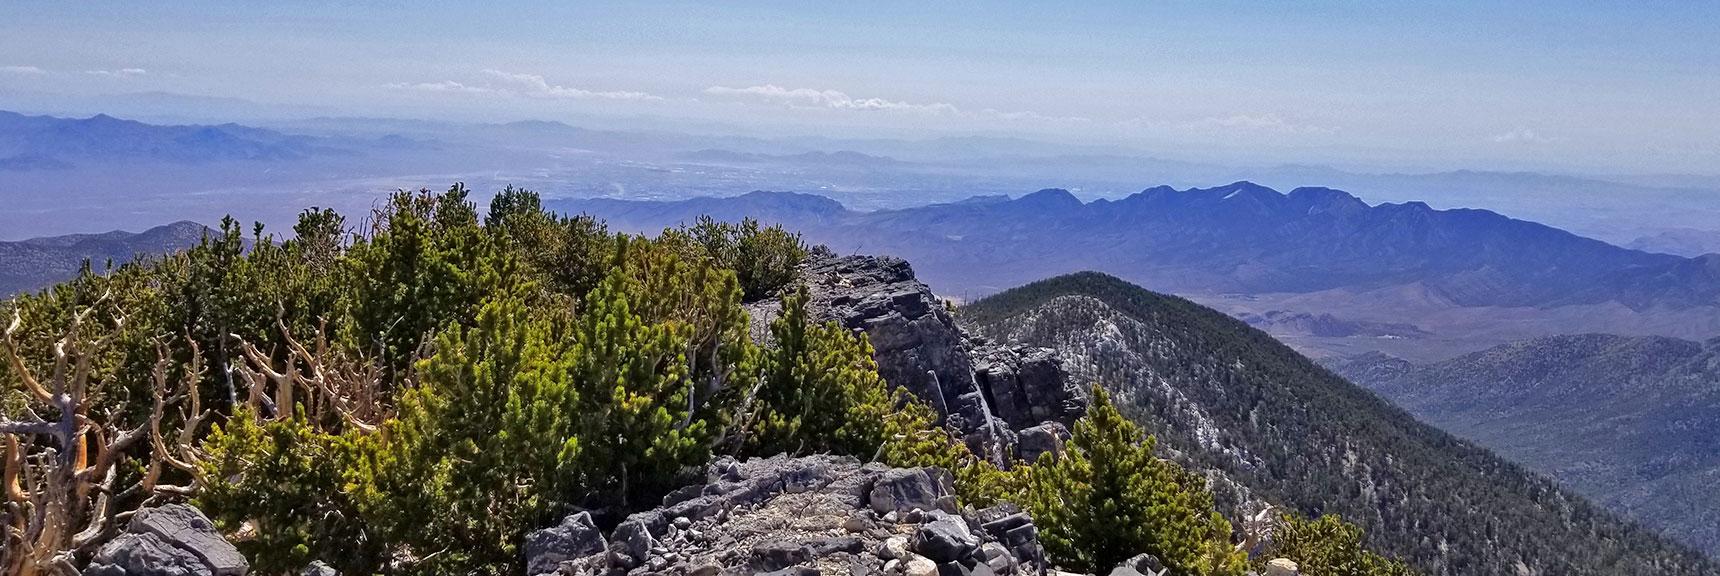 La Madre Mountain and Las Vegas Valley Viewed from Mummy's Toe Summit   Mummy Mountain's Toe, Mt. Charleston Wilderness, Nevada